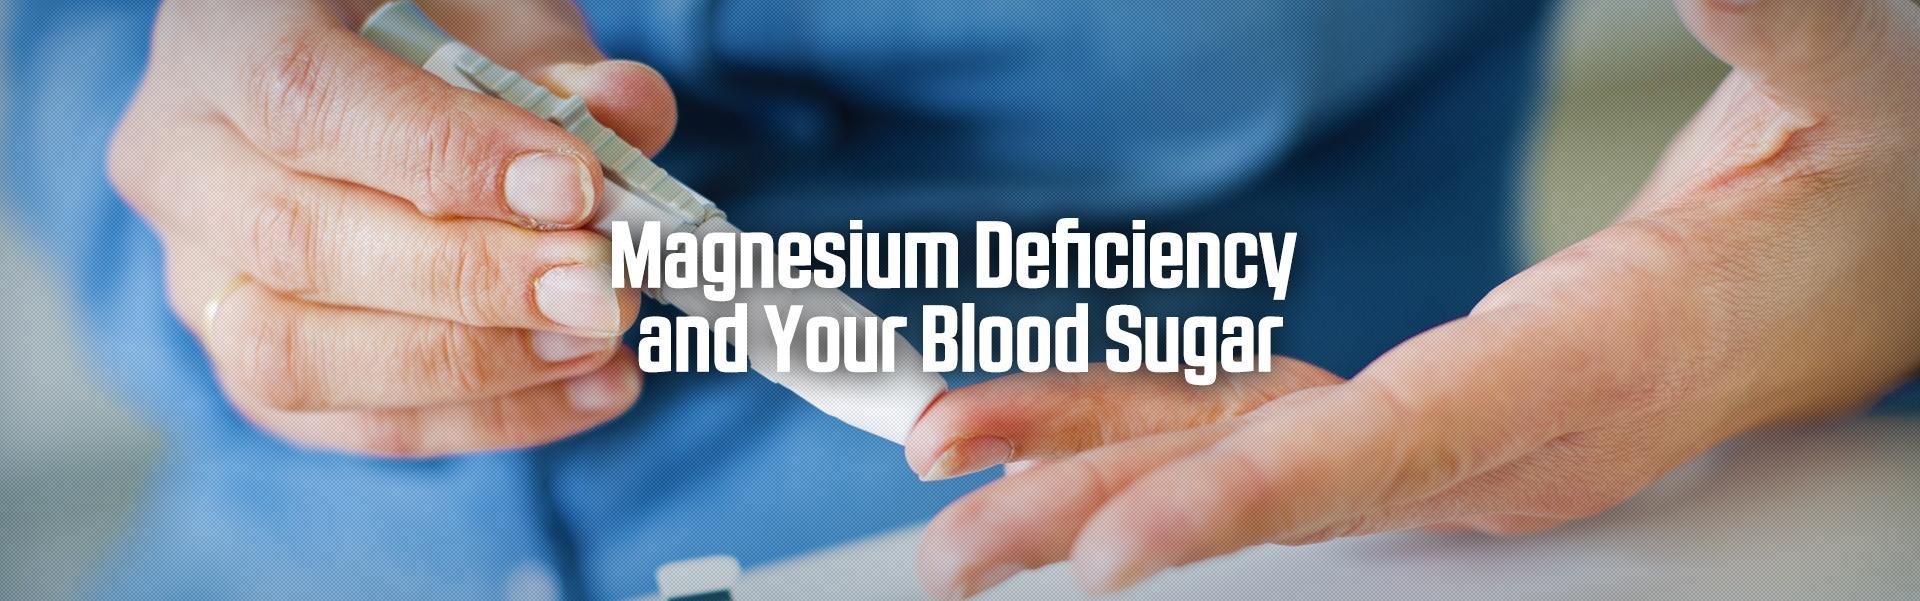 Magnesium And Blood Sugar